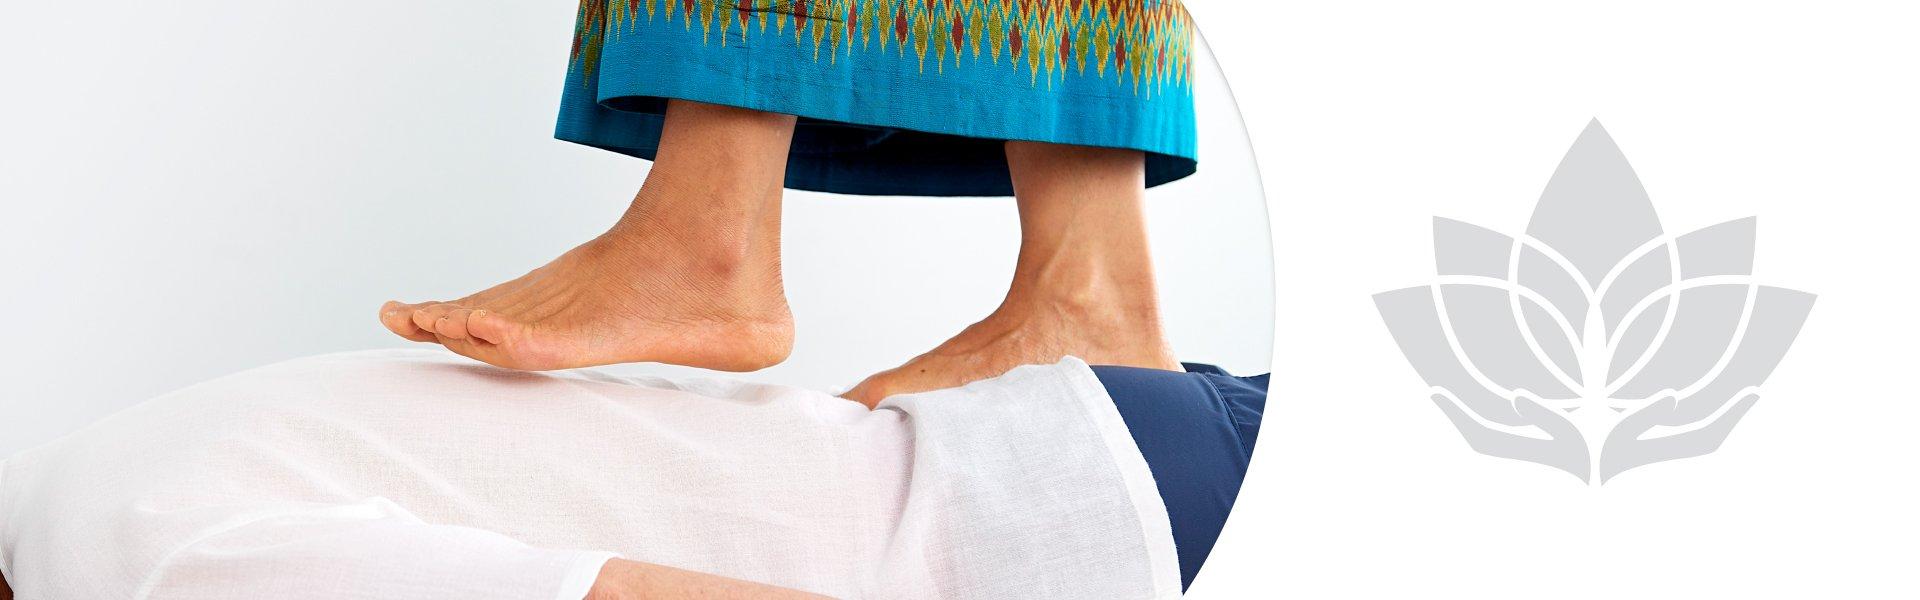 Thai Massages at Krisada Thai Massage Clinic in Mount Maunganui and Te Puke